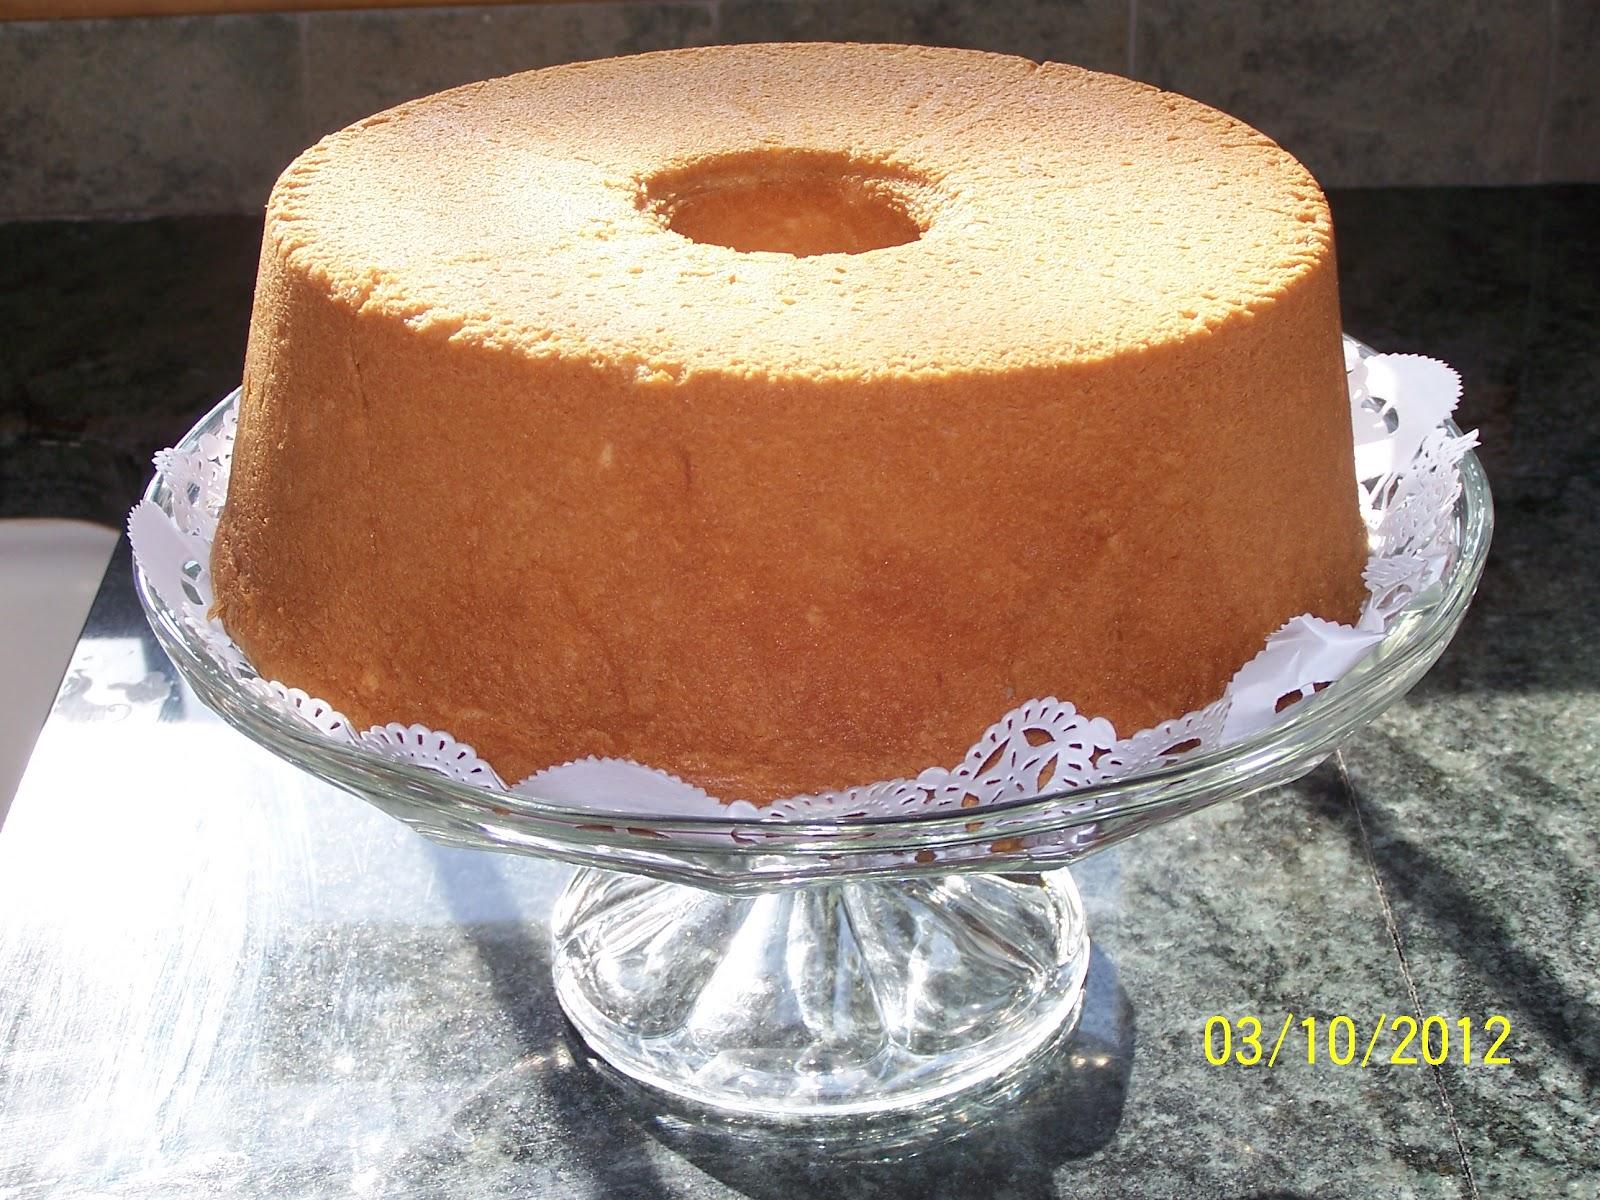 Lemon Pound Cake Using Swans Cake Flour